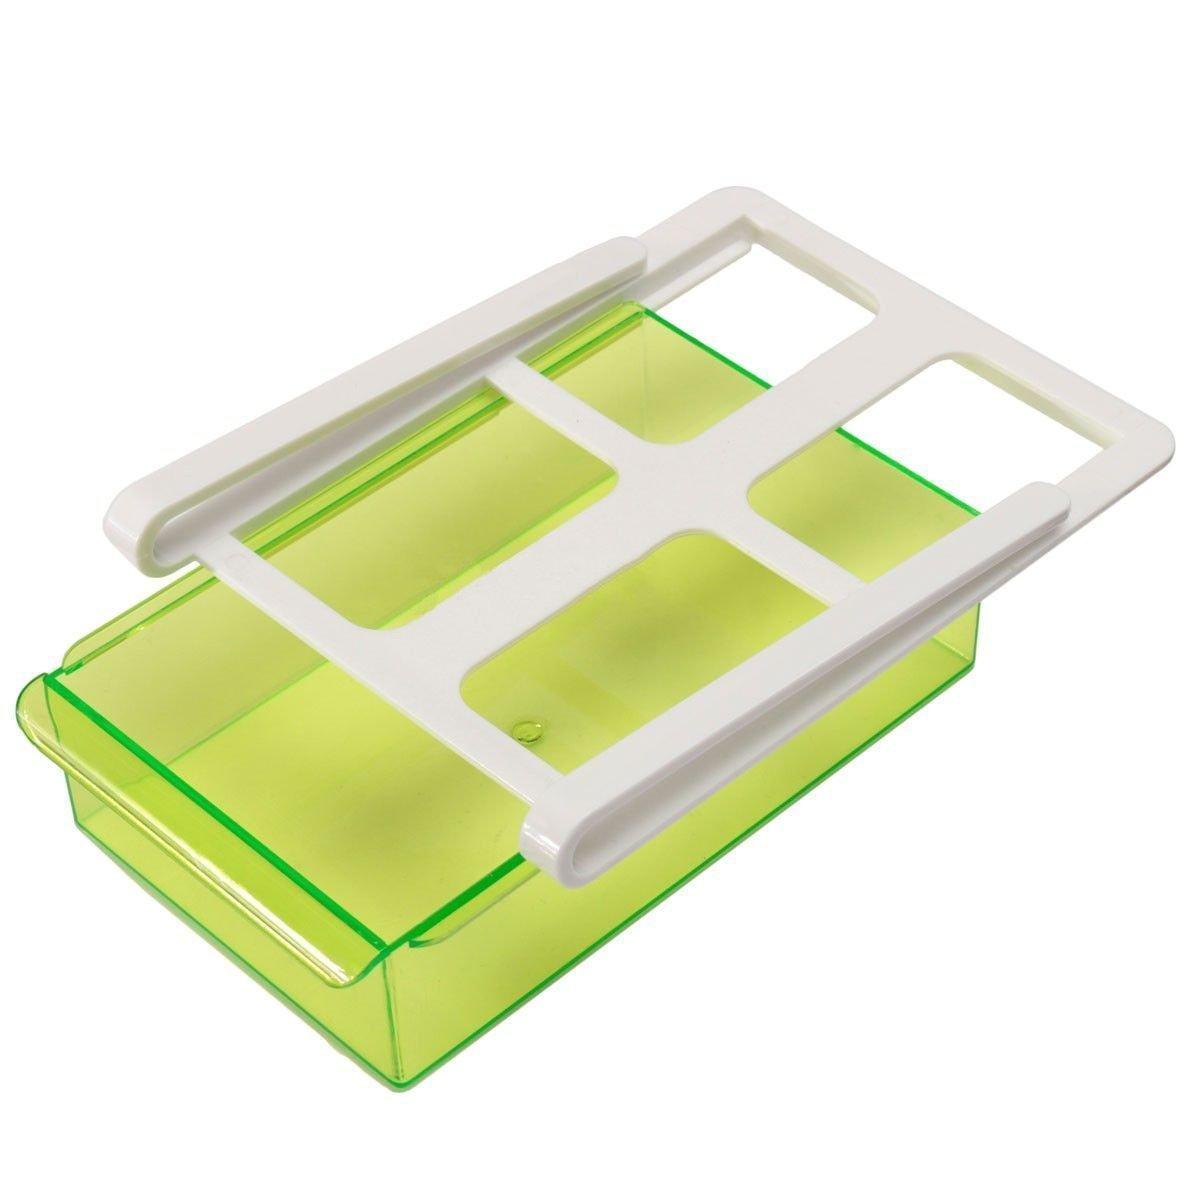 MingXiao Refrigerator Drawer Organizer Slide Fridge Freezer Organizer Refrigerator Storage Rack Shelf Drawer Green